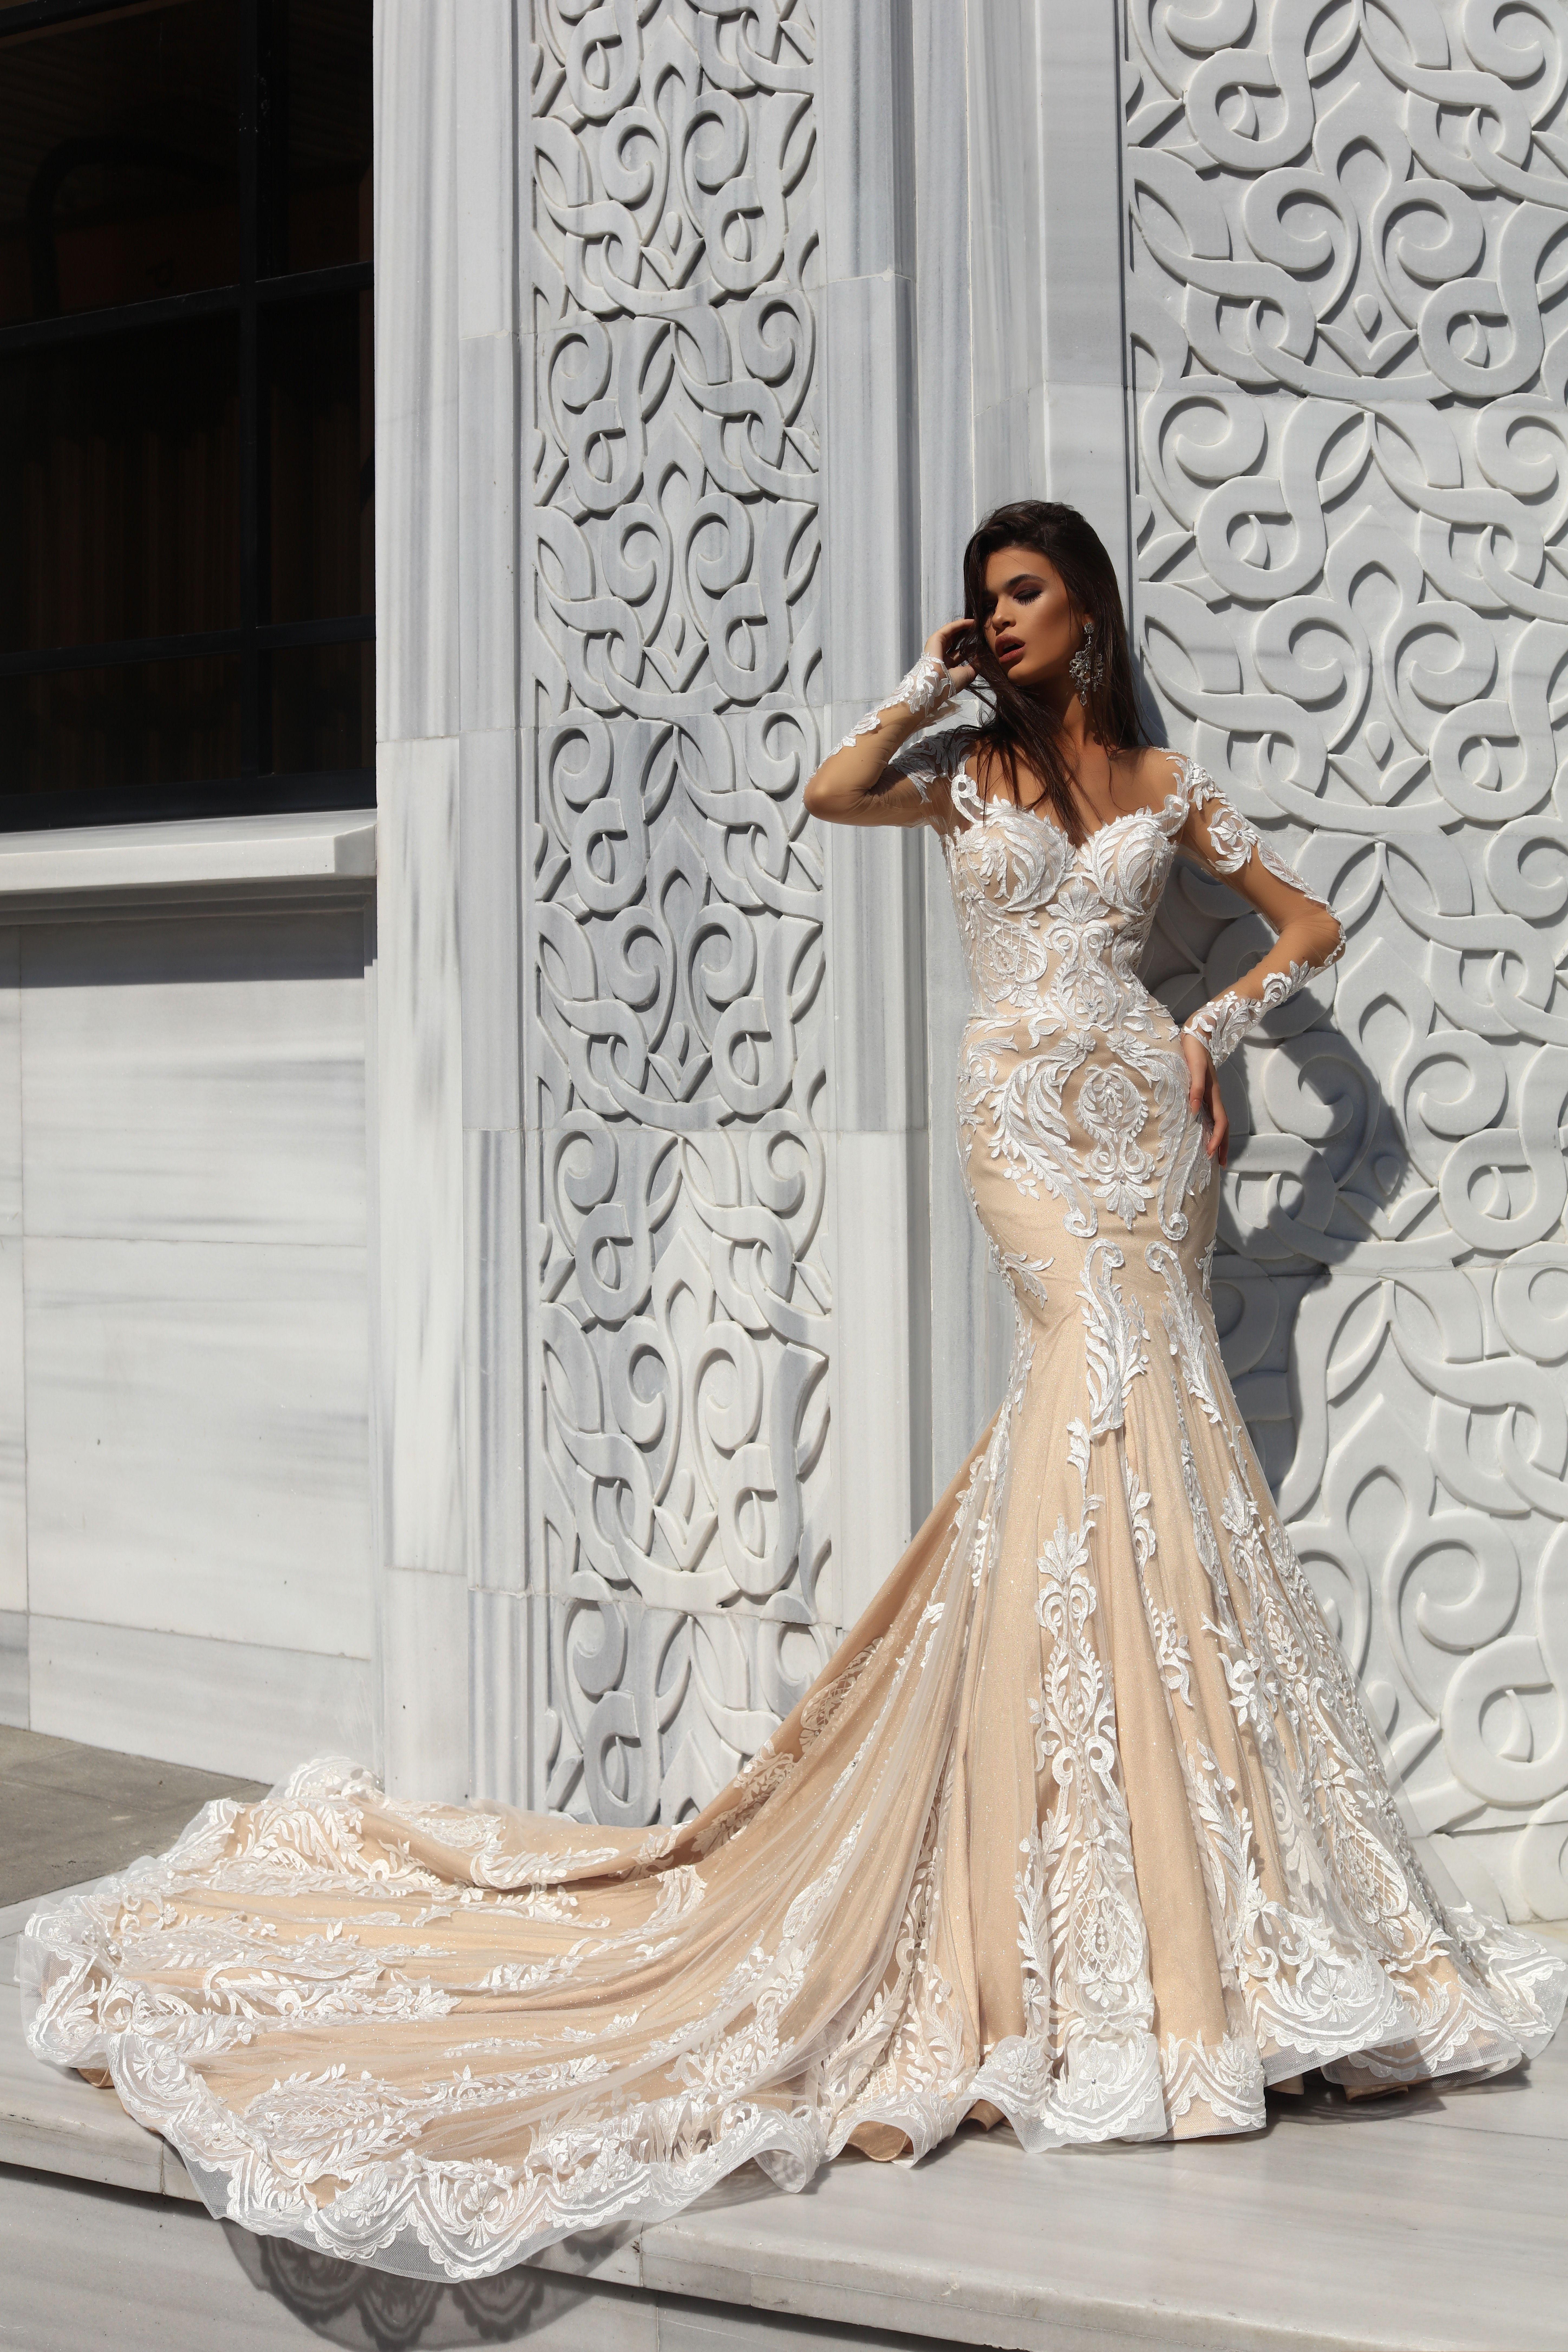 Lace Sleeved Mermaid Ballgown Wedding Dresses Wedding Gowns Lace Wedding Gowns With Sleeves